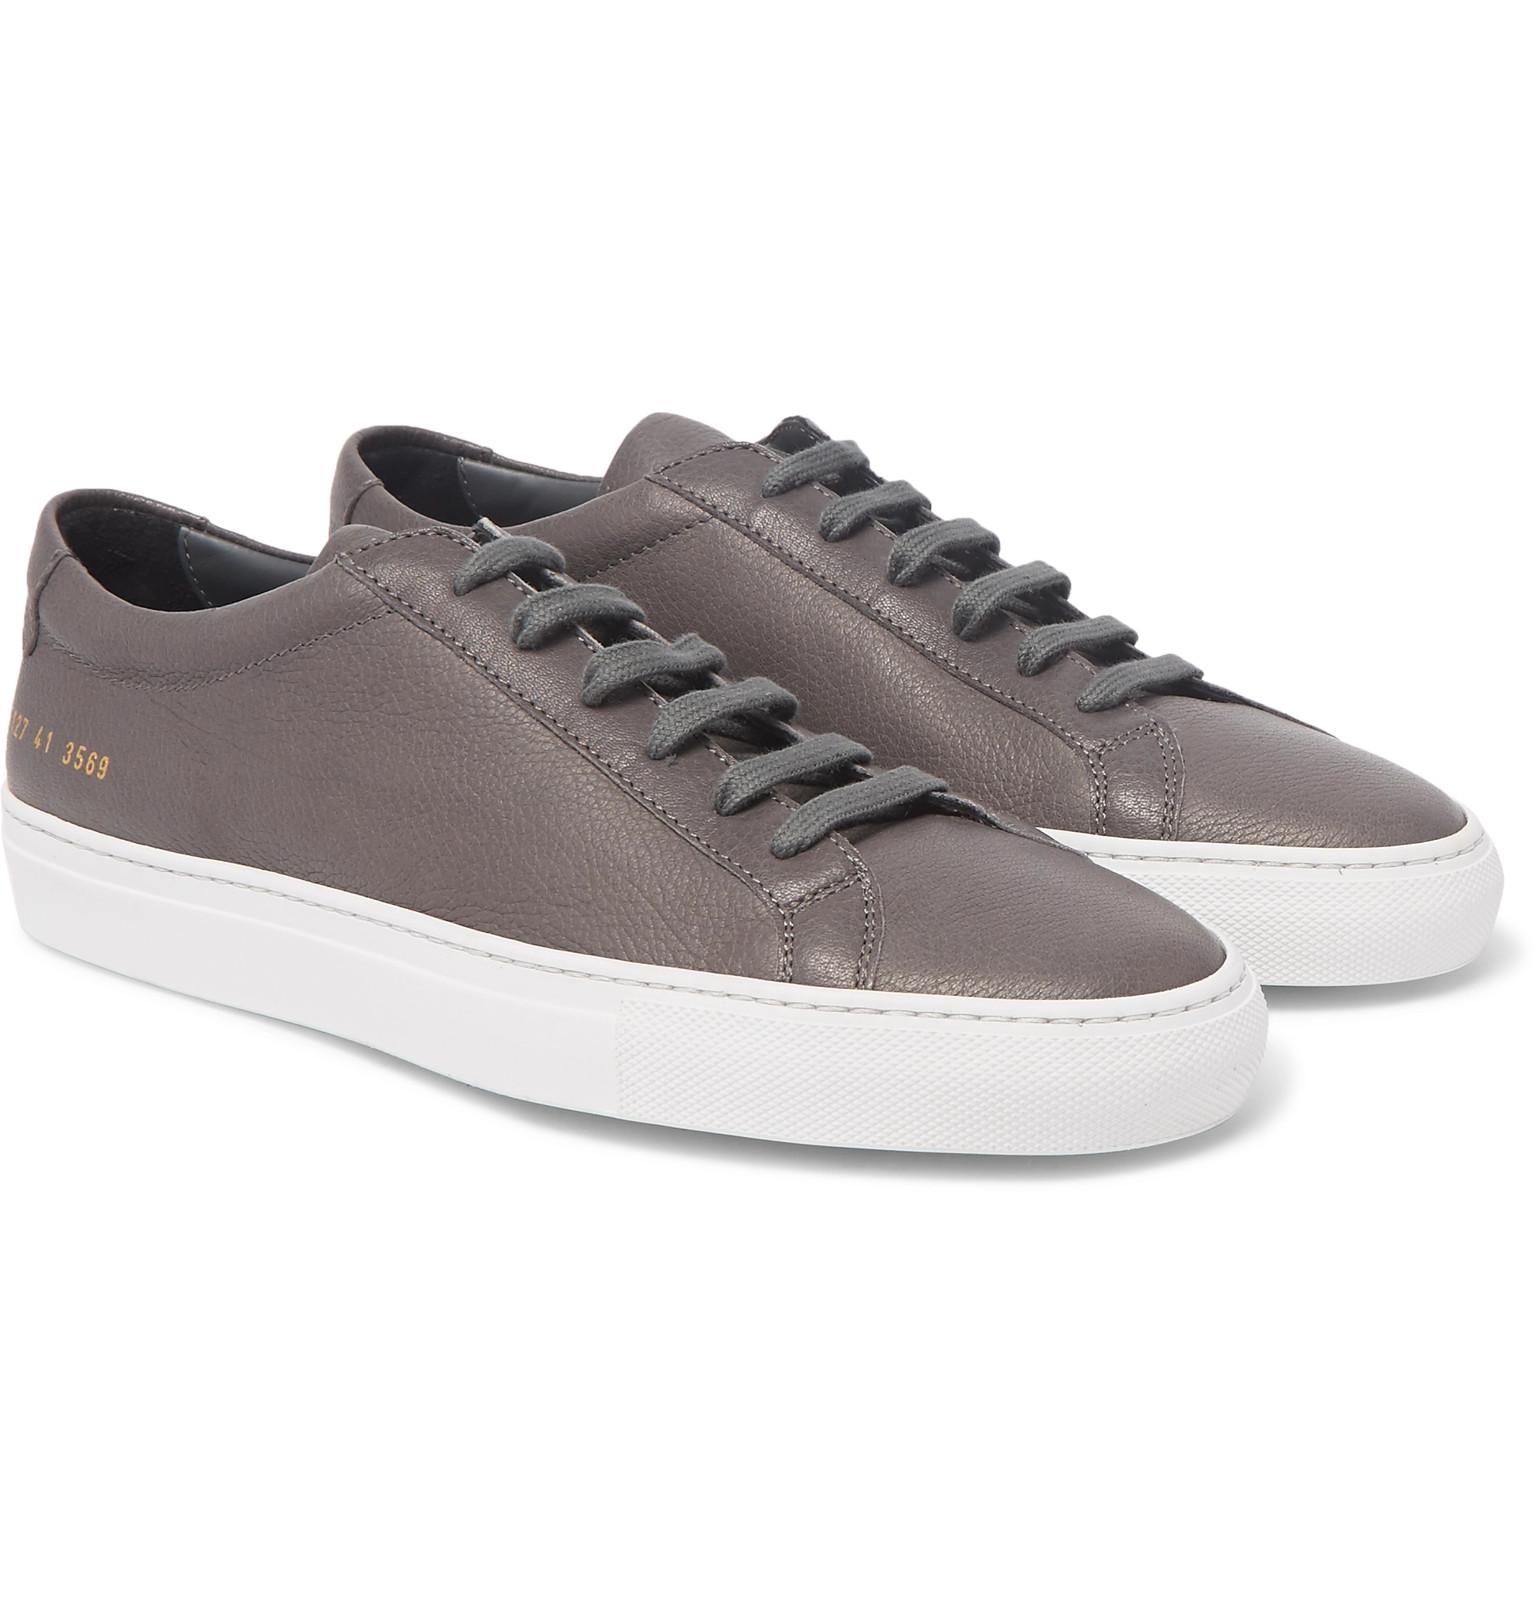 Original Achilles Full-grain Leather Sneakers Common Projects VvJ1GUnPW